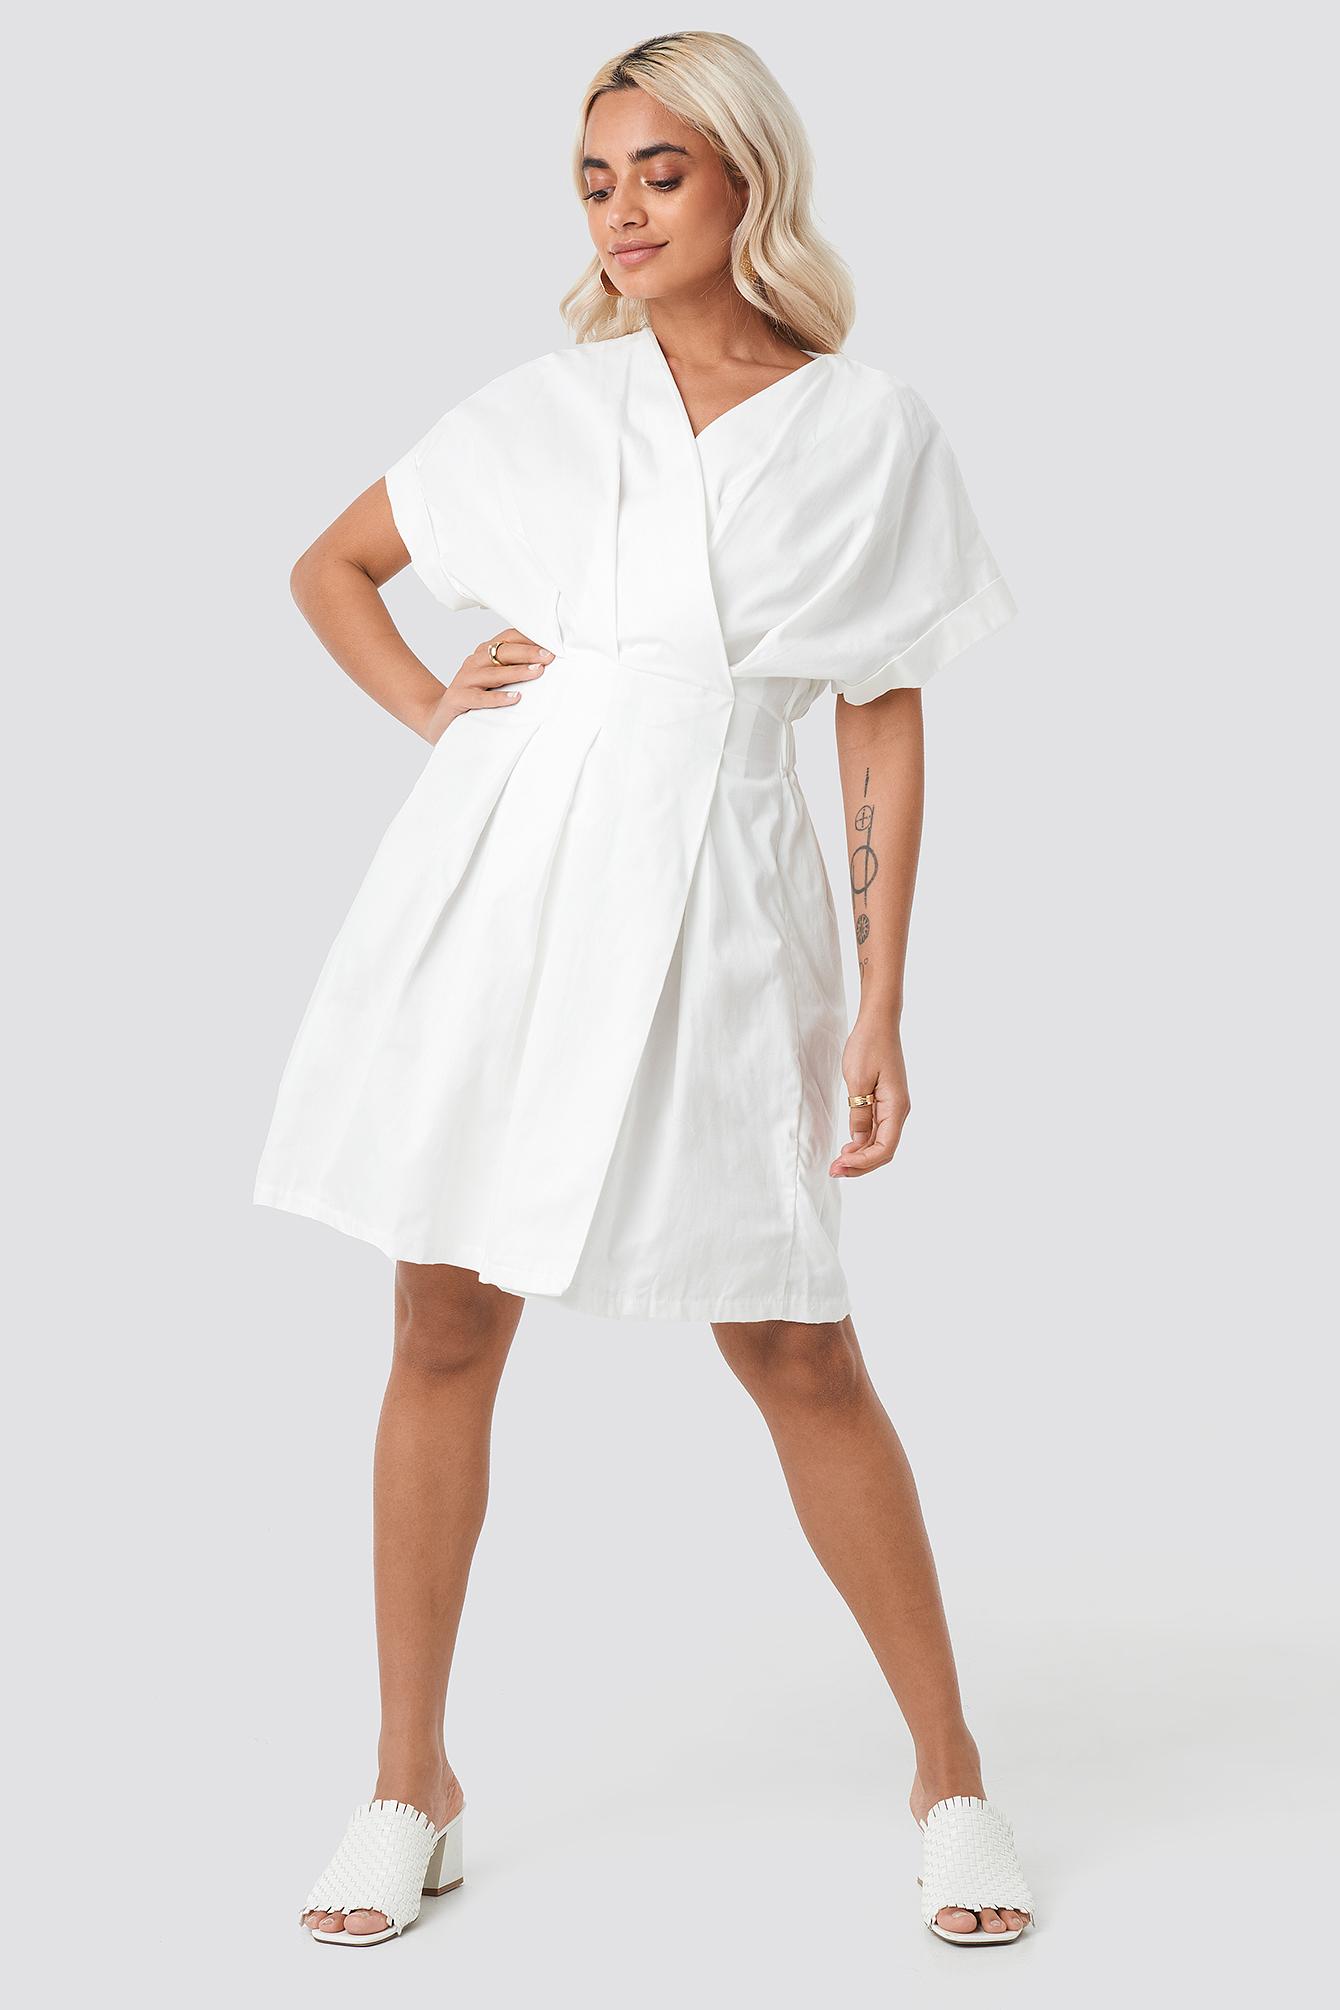 Yol Double Breasted Dress NA-KD.COM